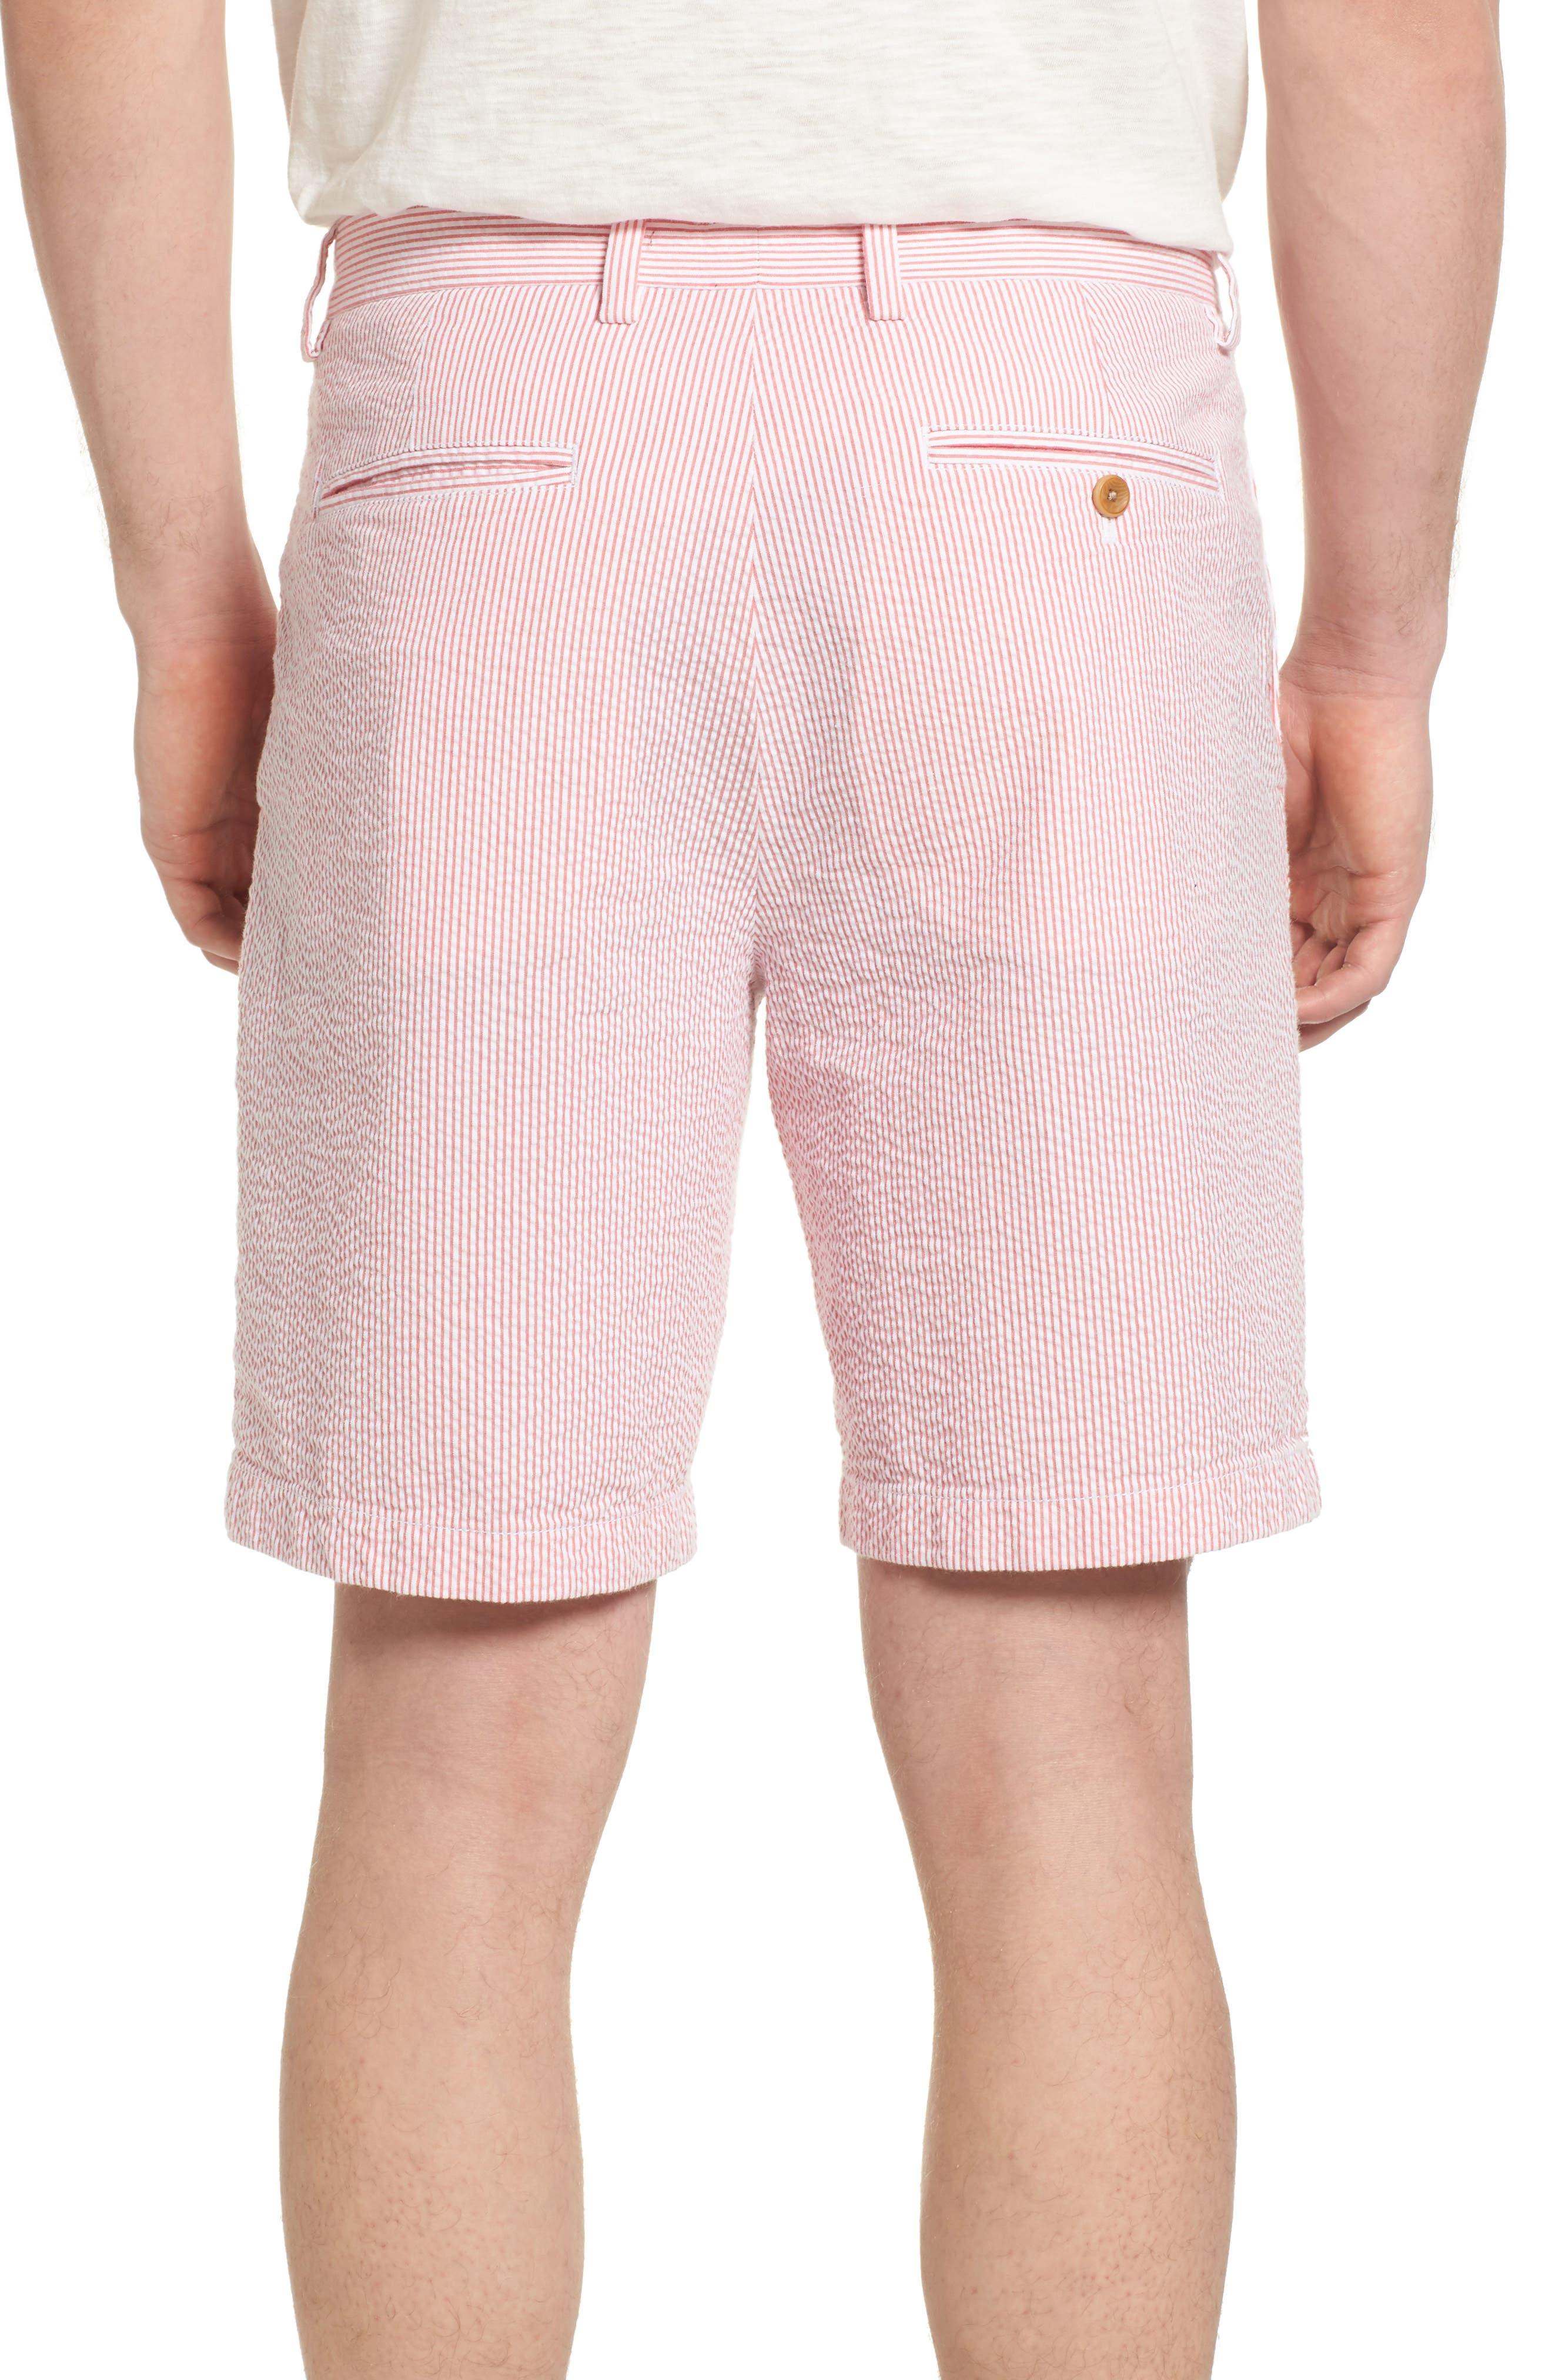 9 Inch Seersucker Shorts,                             Alternate thumbnail 4, color,